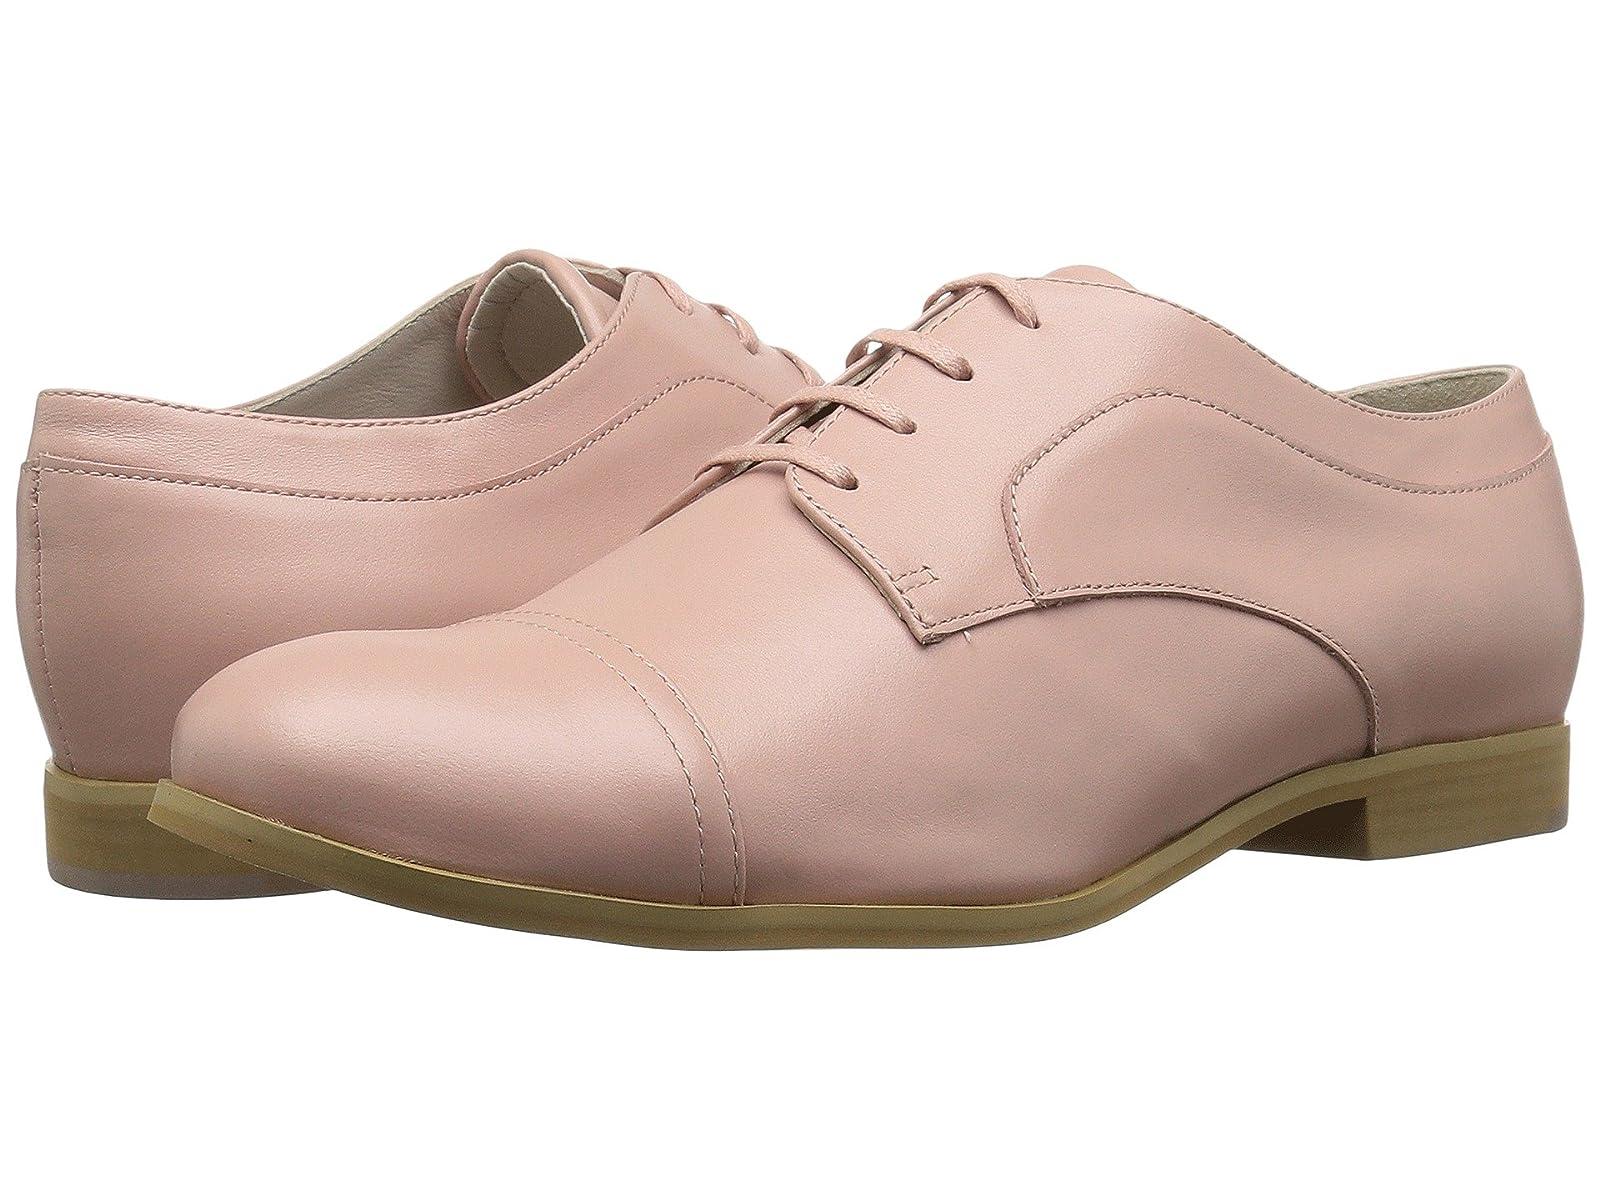 Jil Sander Navy JN28089Cheap and distinctive eye-catching shoes